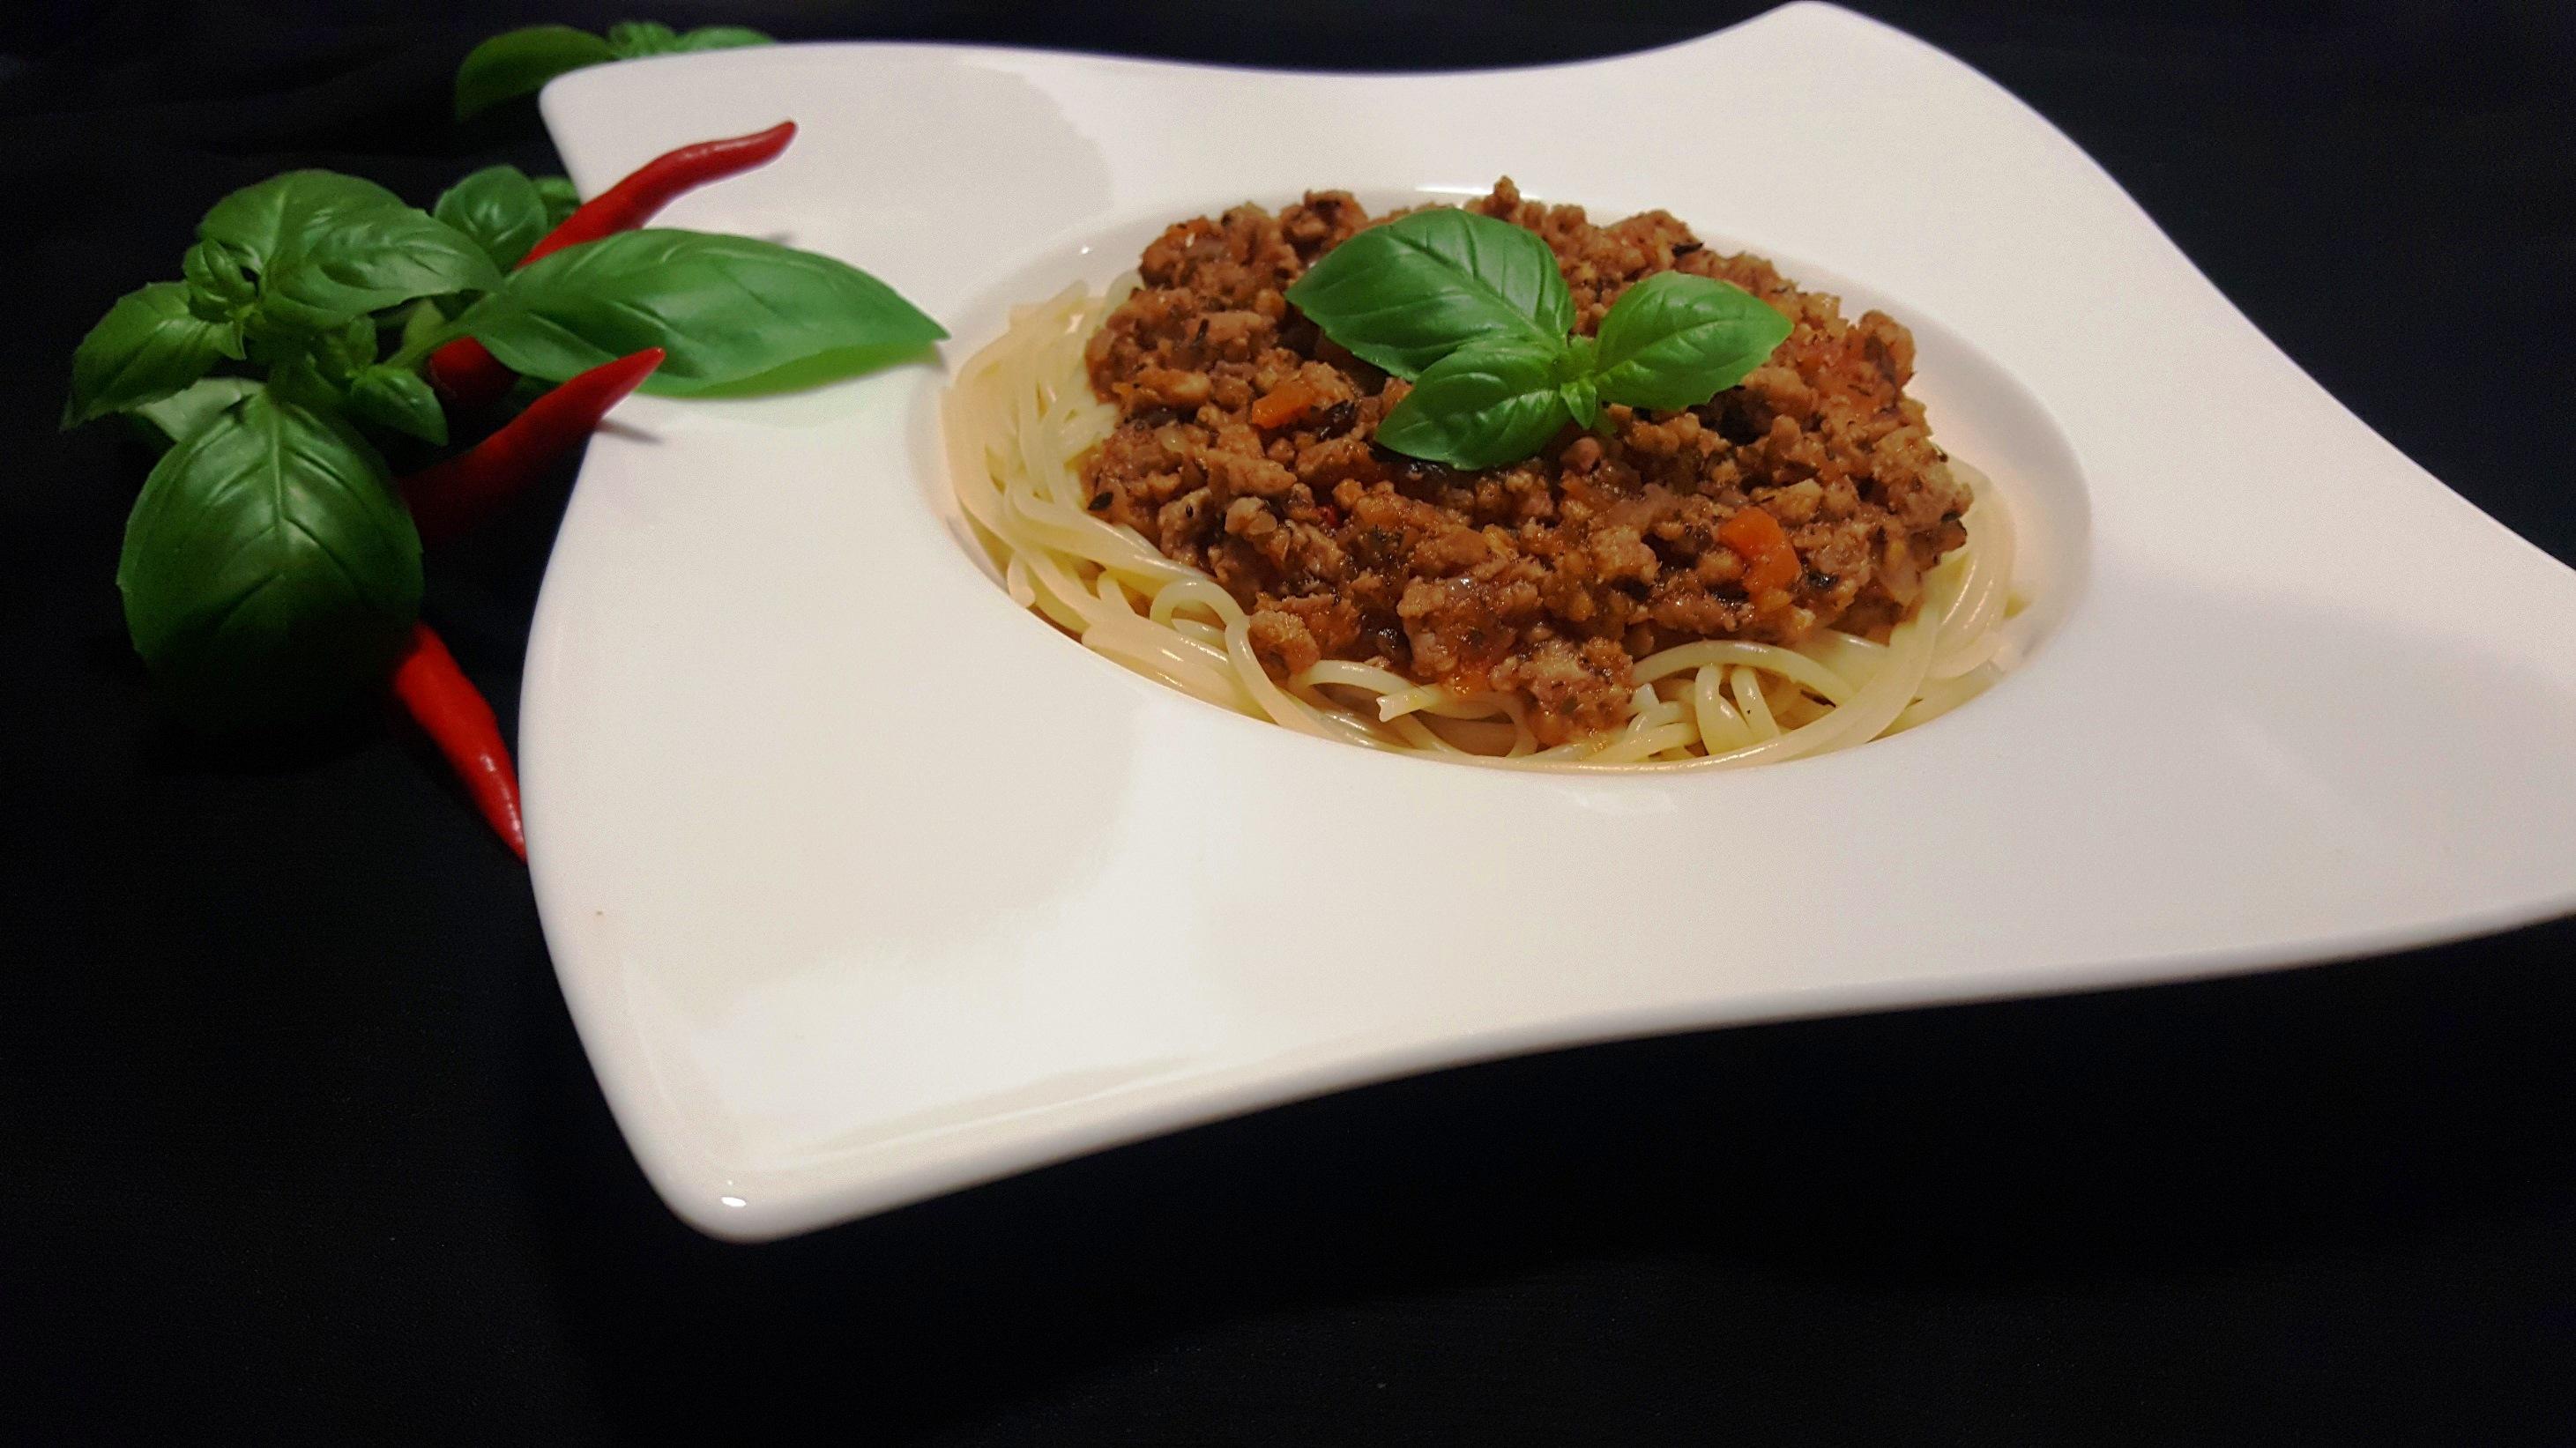 Spaghetti Bplognese